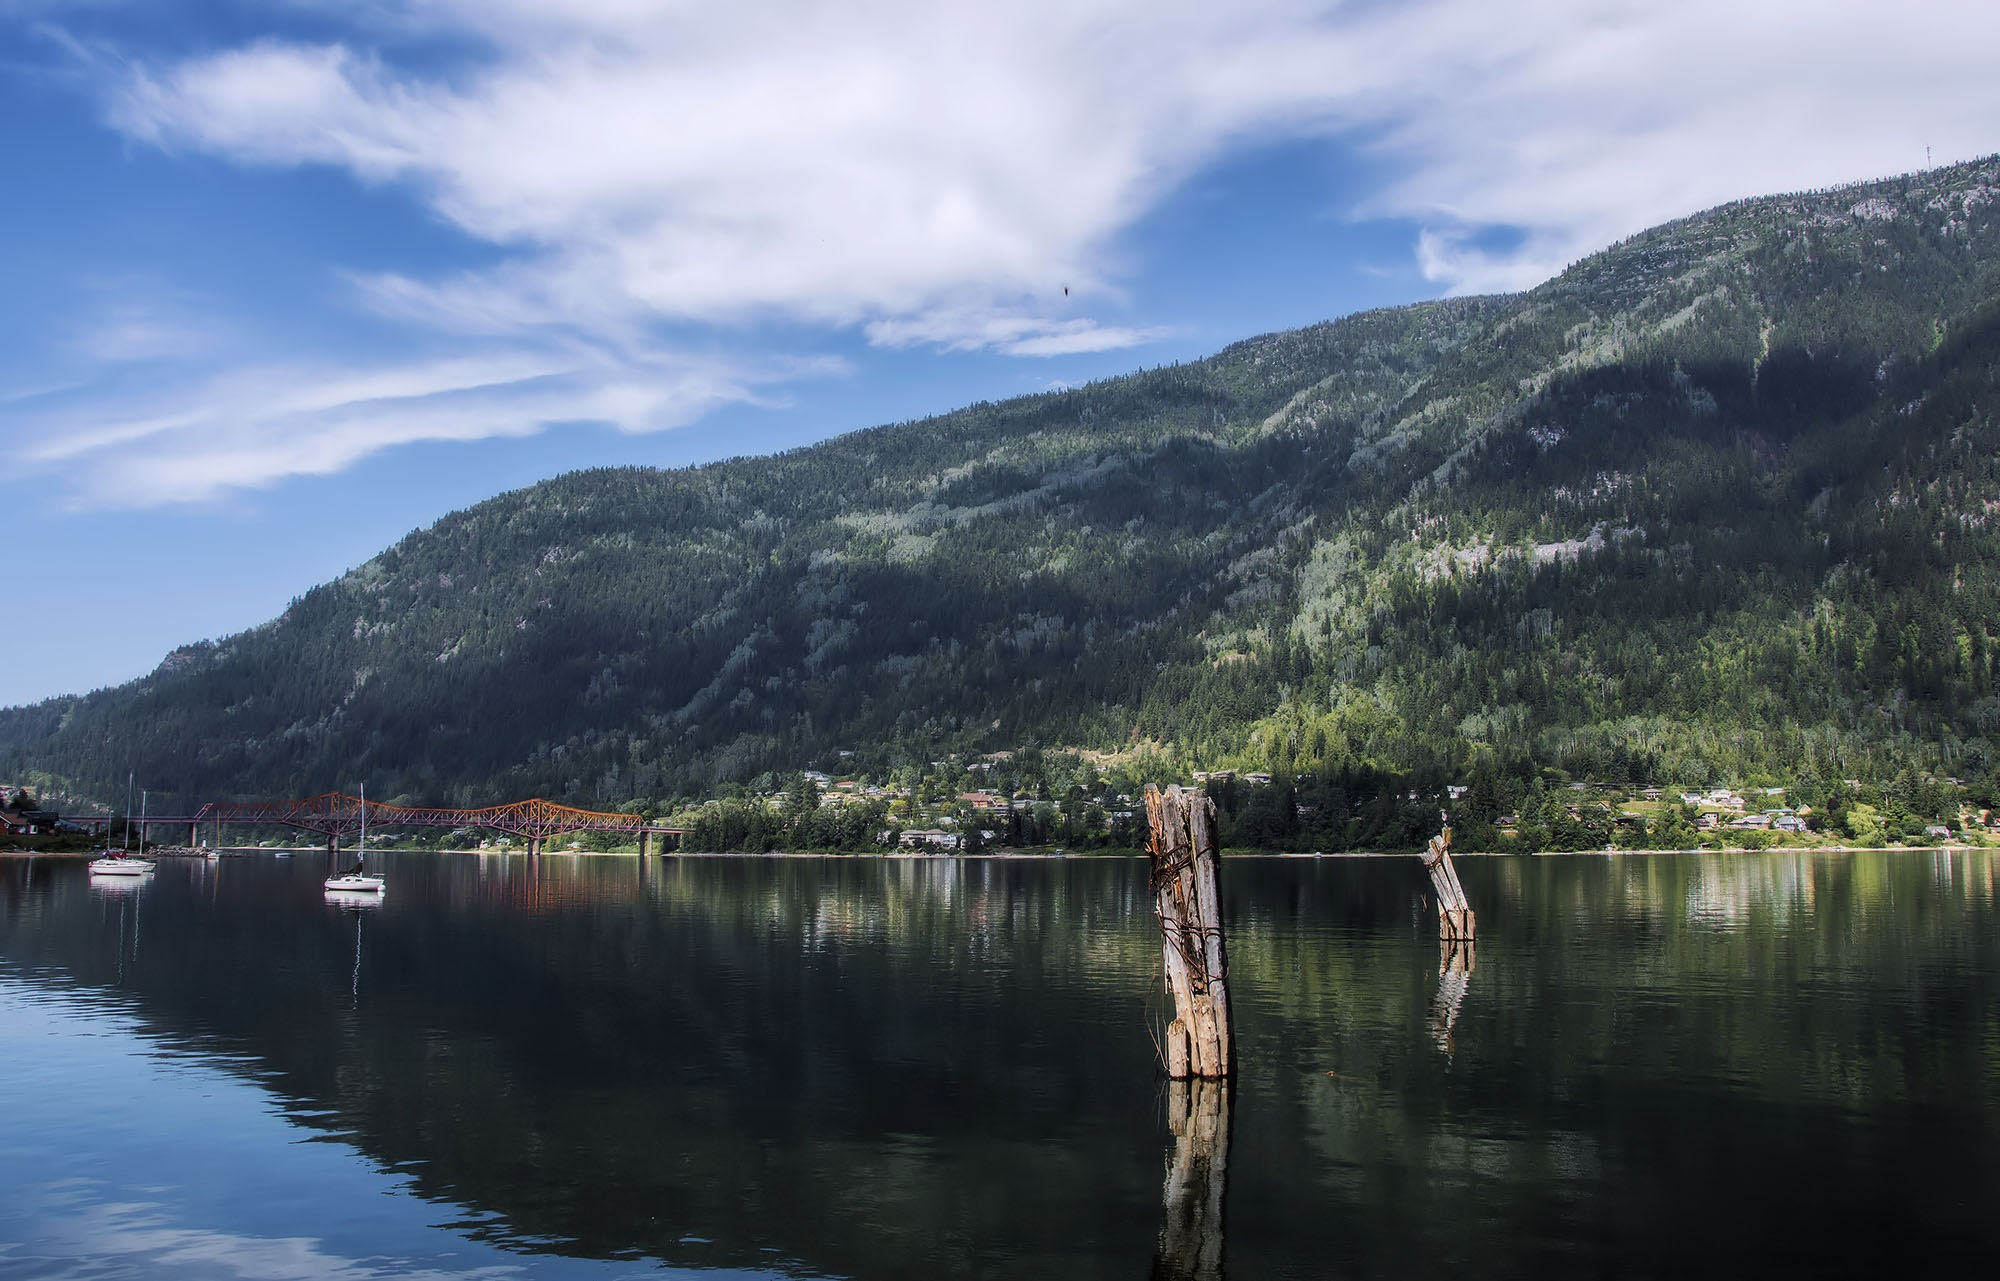 Kootenay lake by MadeleineGuenette